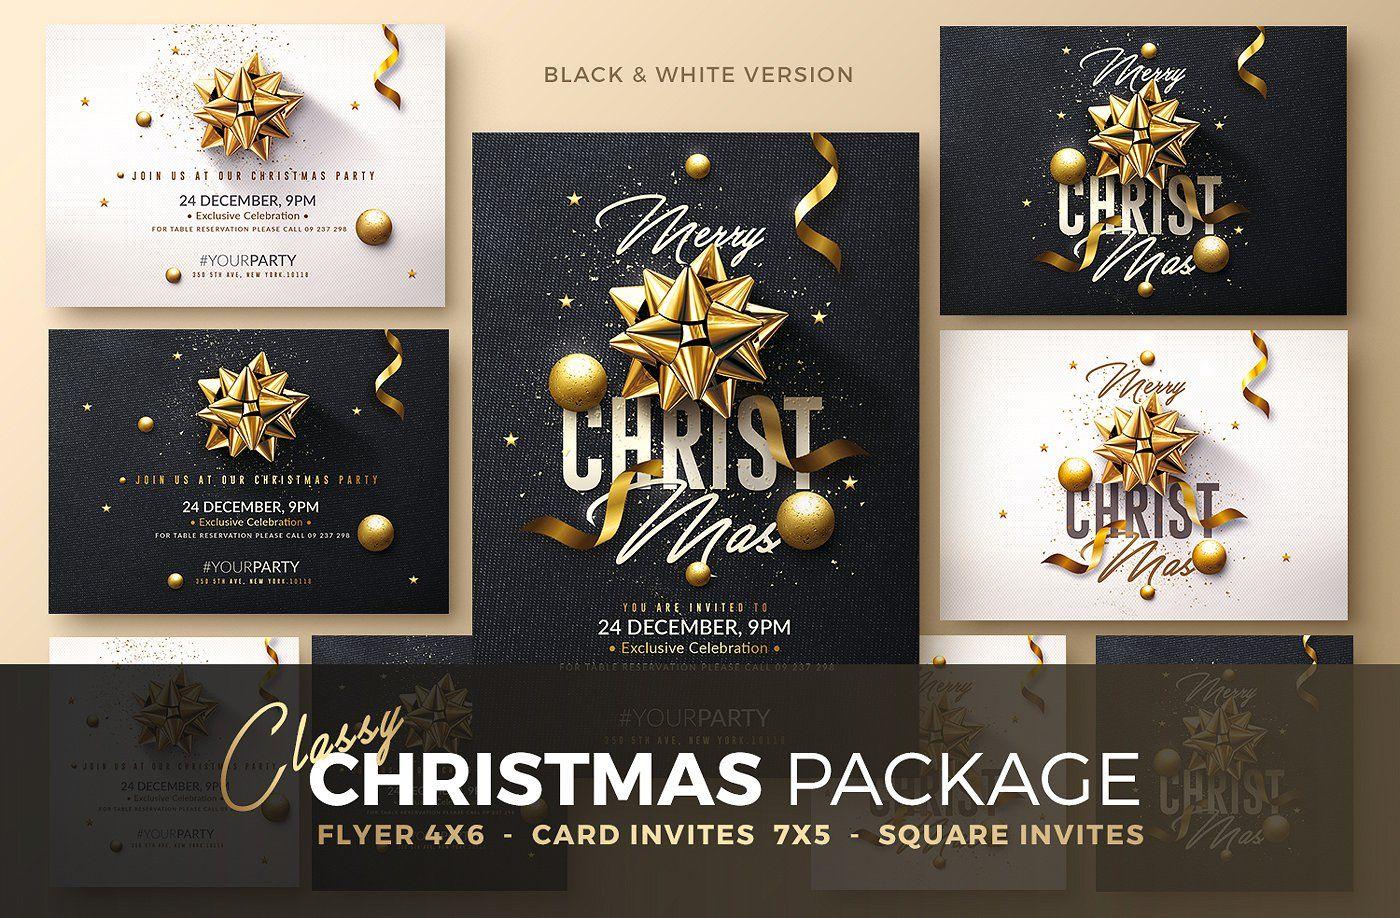 Christmas Invitation Psd Package Christmas Invitations Invitations Christmas Packaging